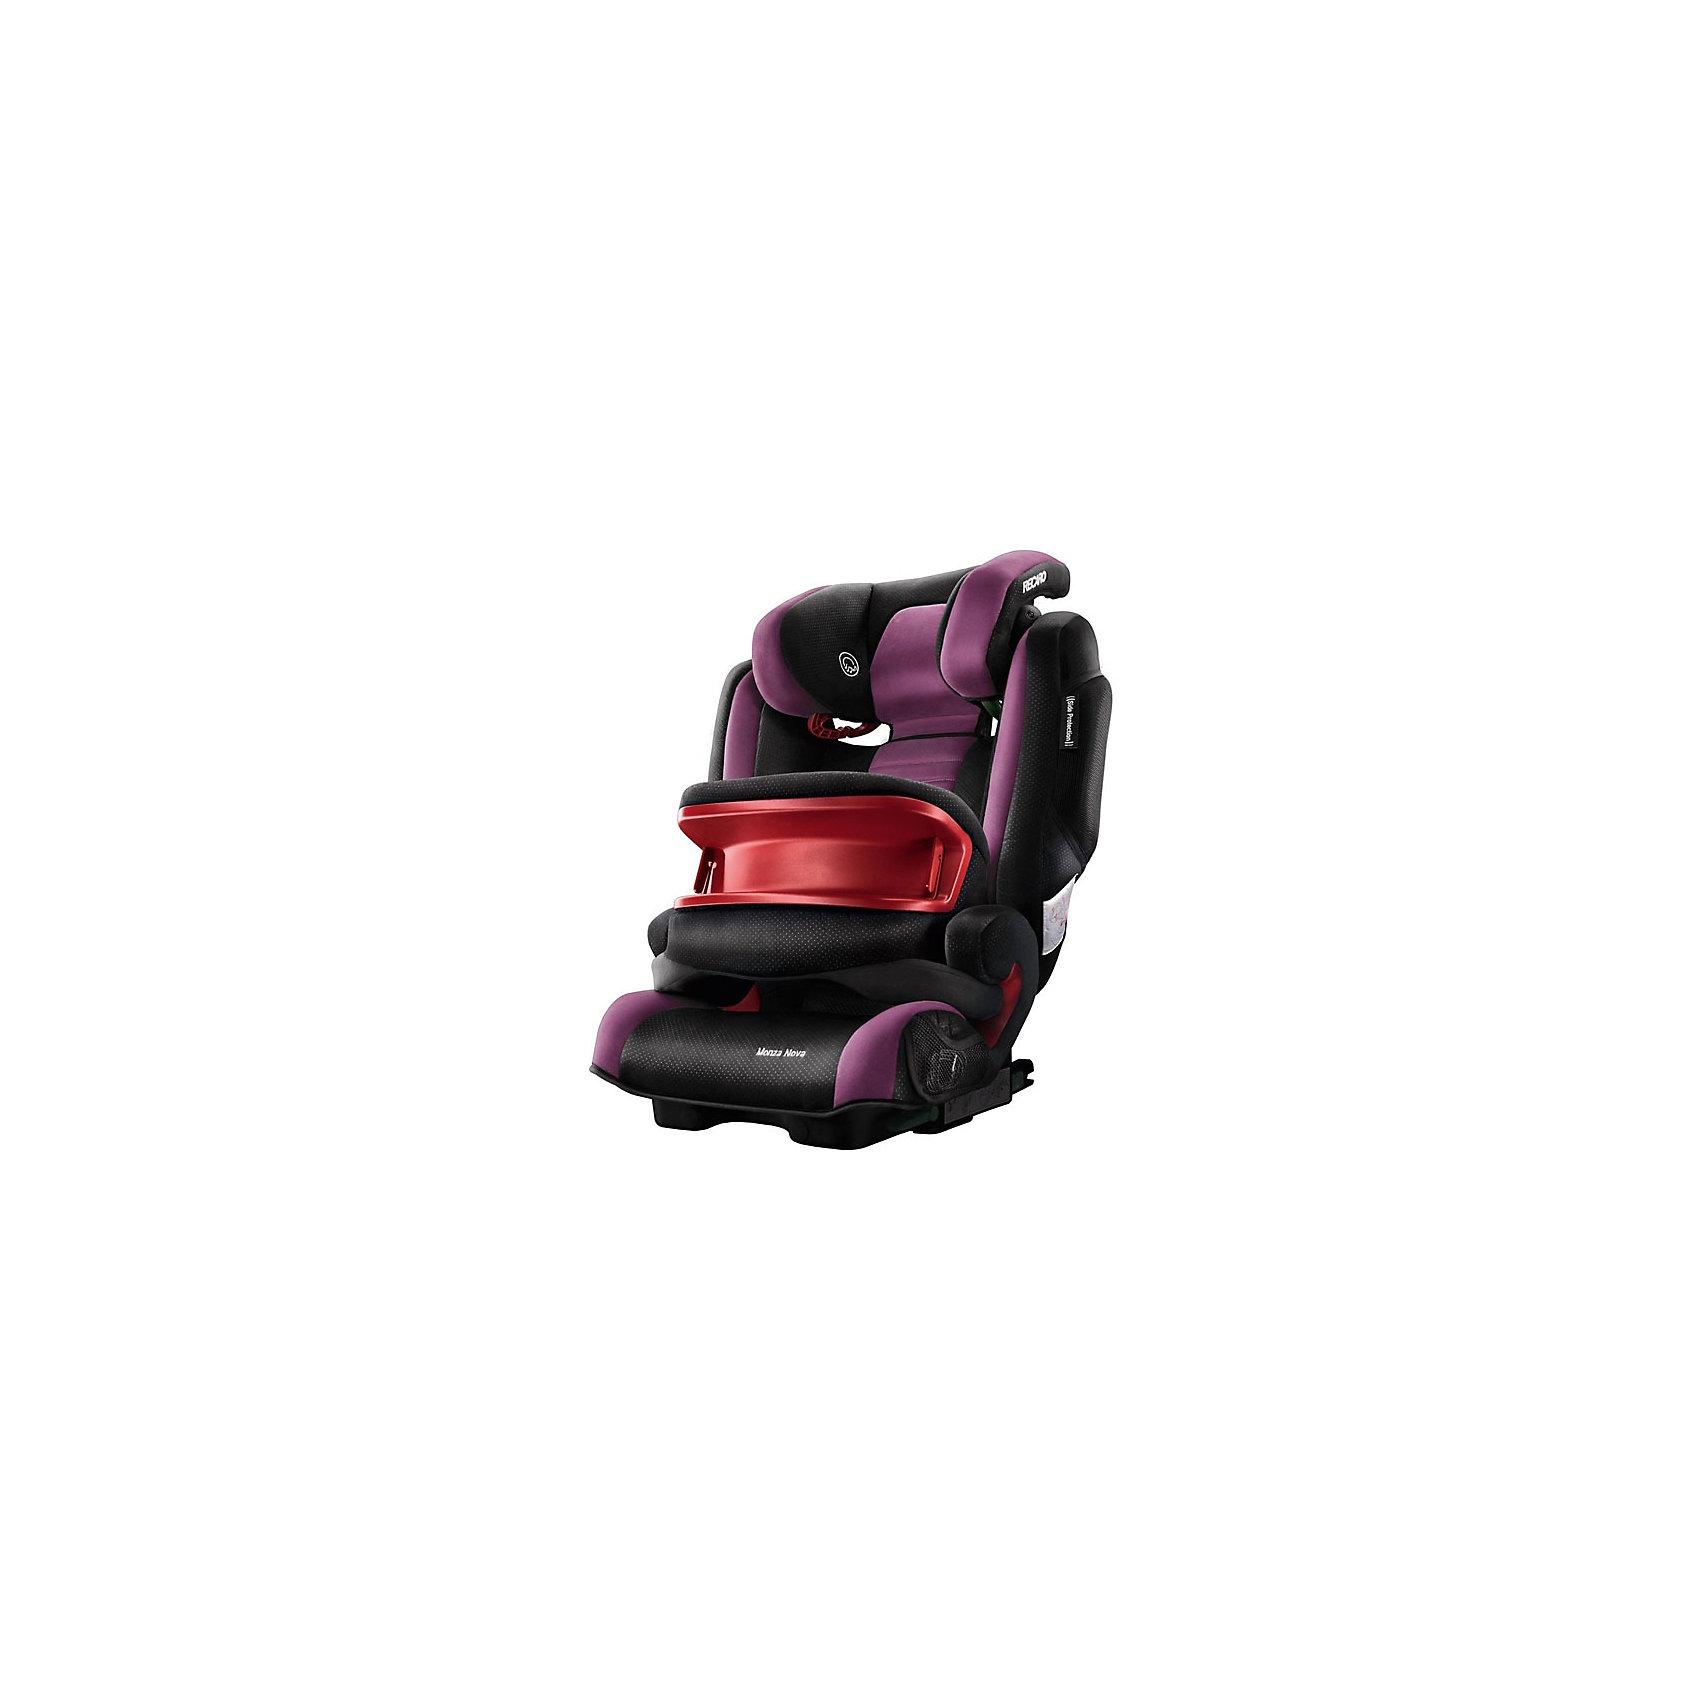 Автокресло RECARO Monza Nova IS SF, 9-36 кг, violet